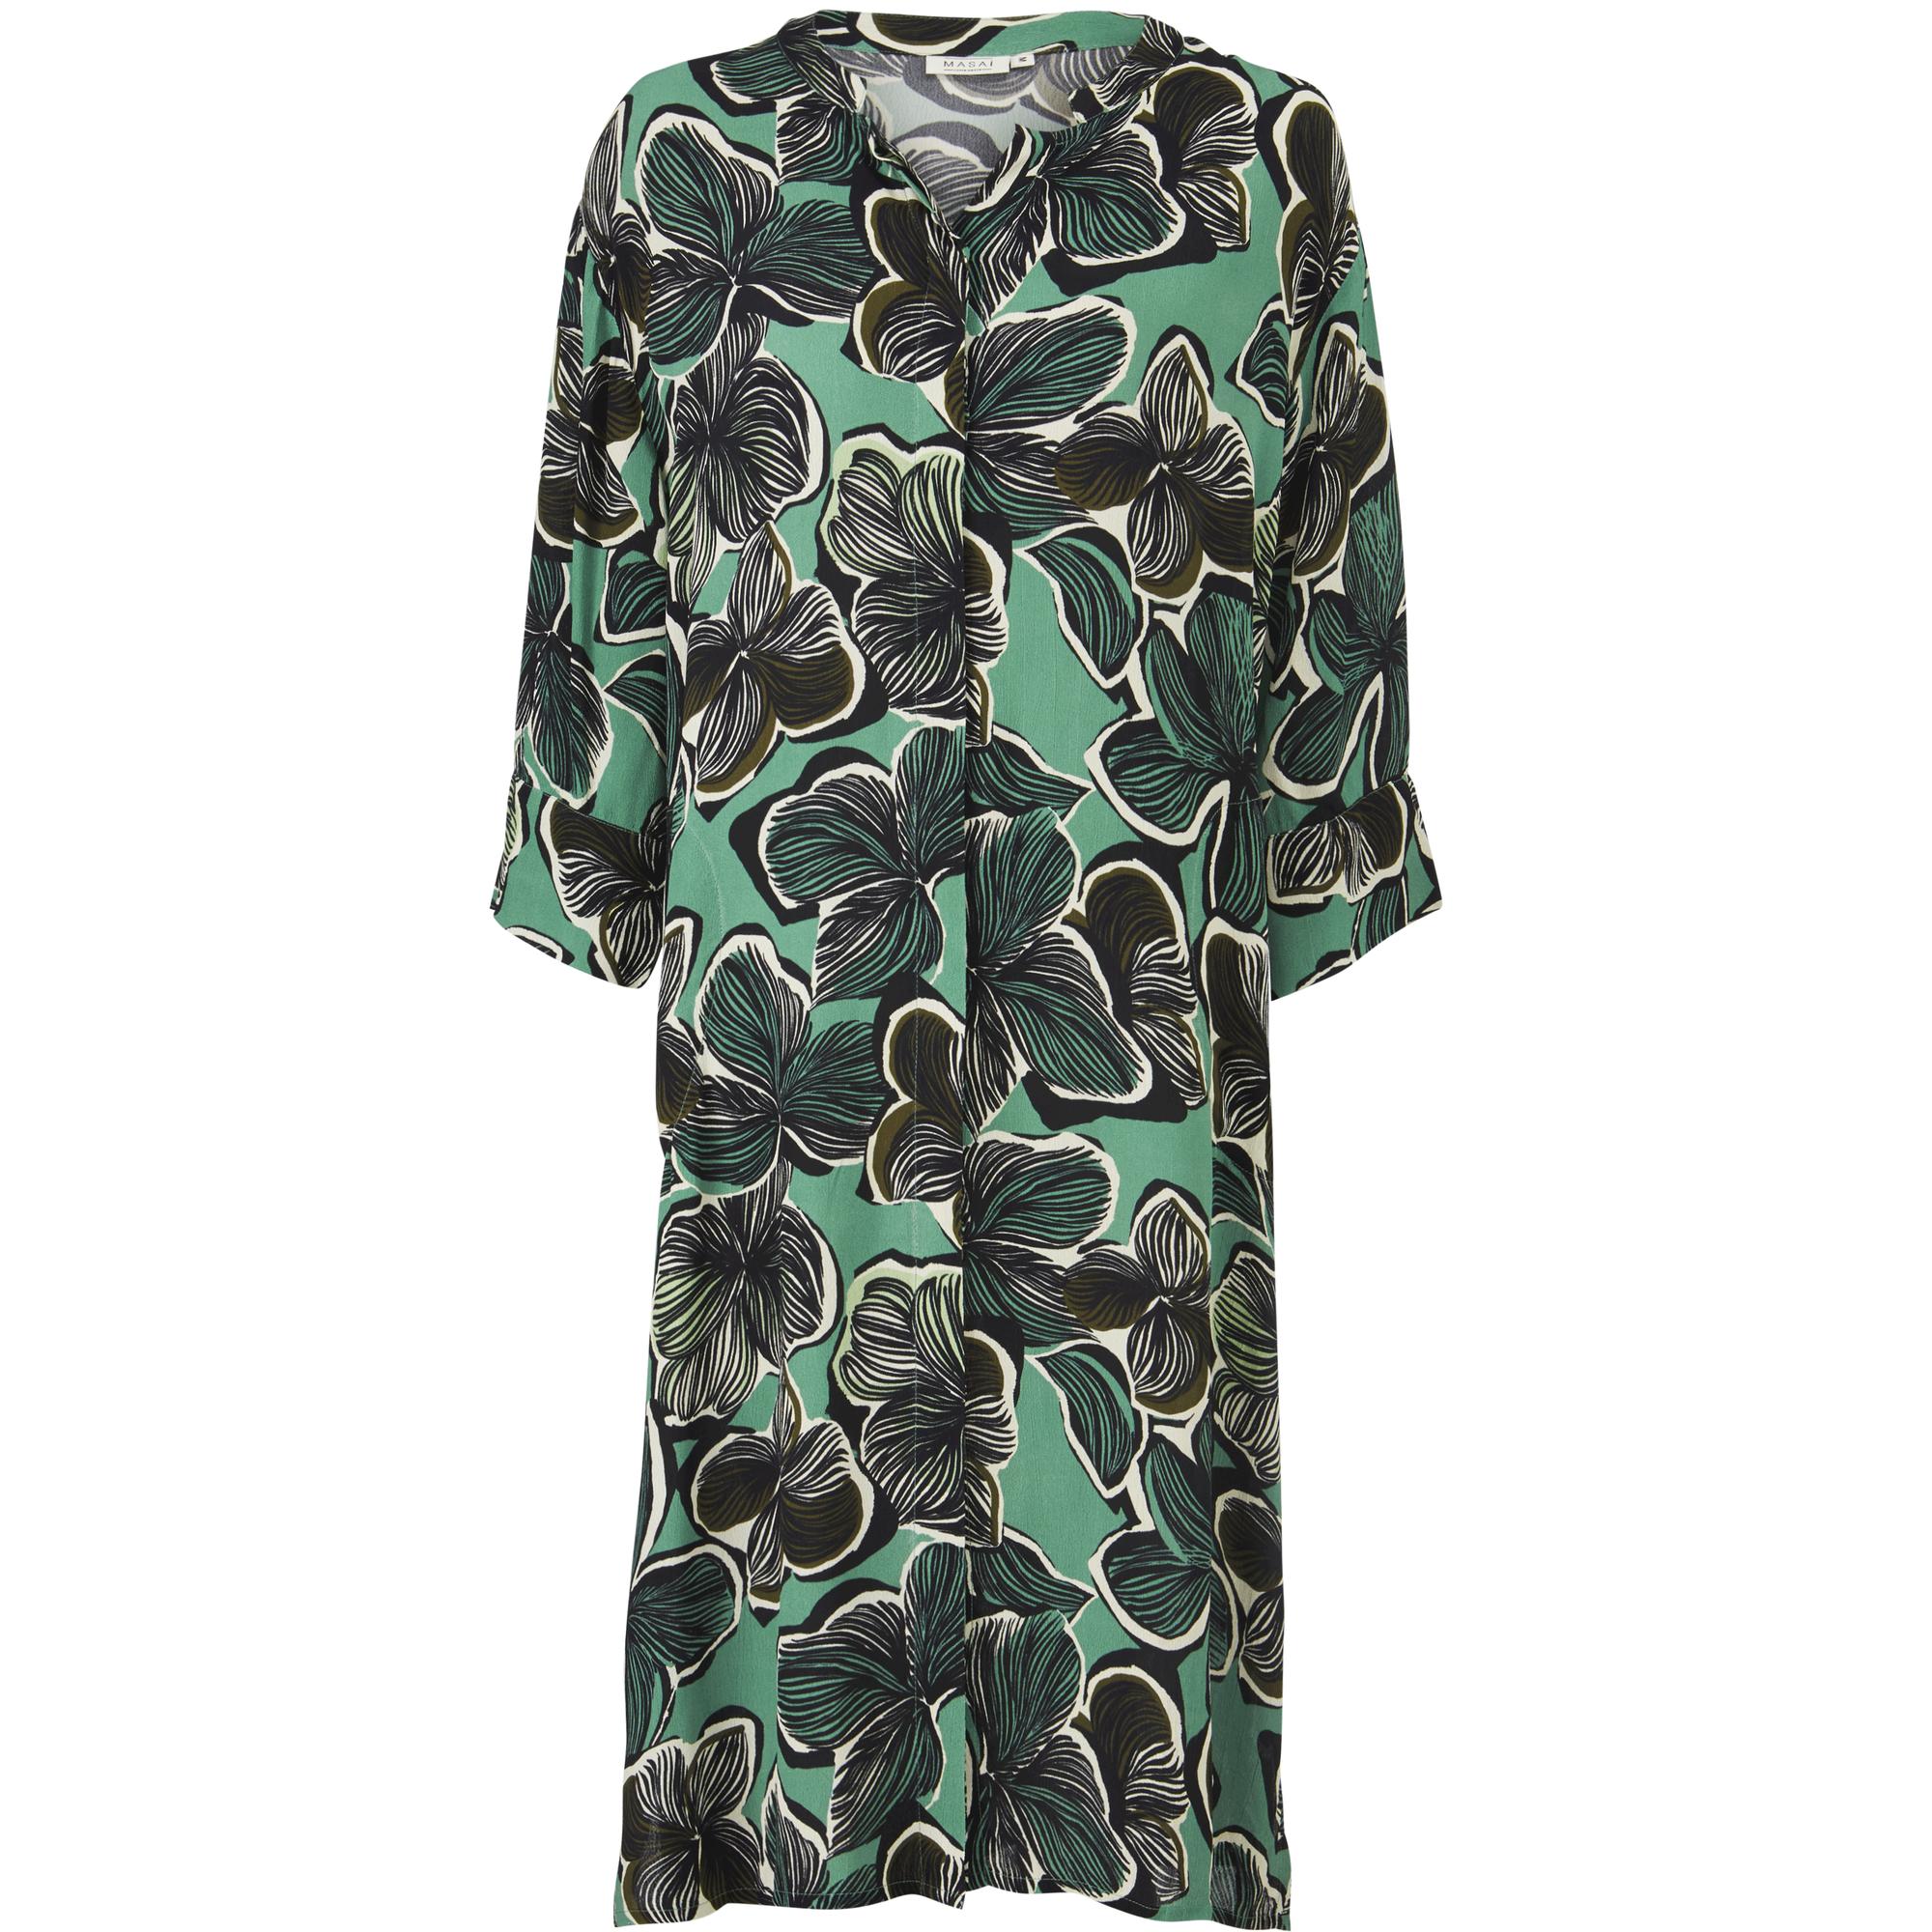 NIMES SHIRT DRESS, Bottle Green, hi-res